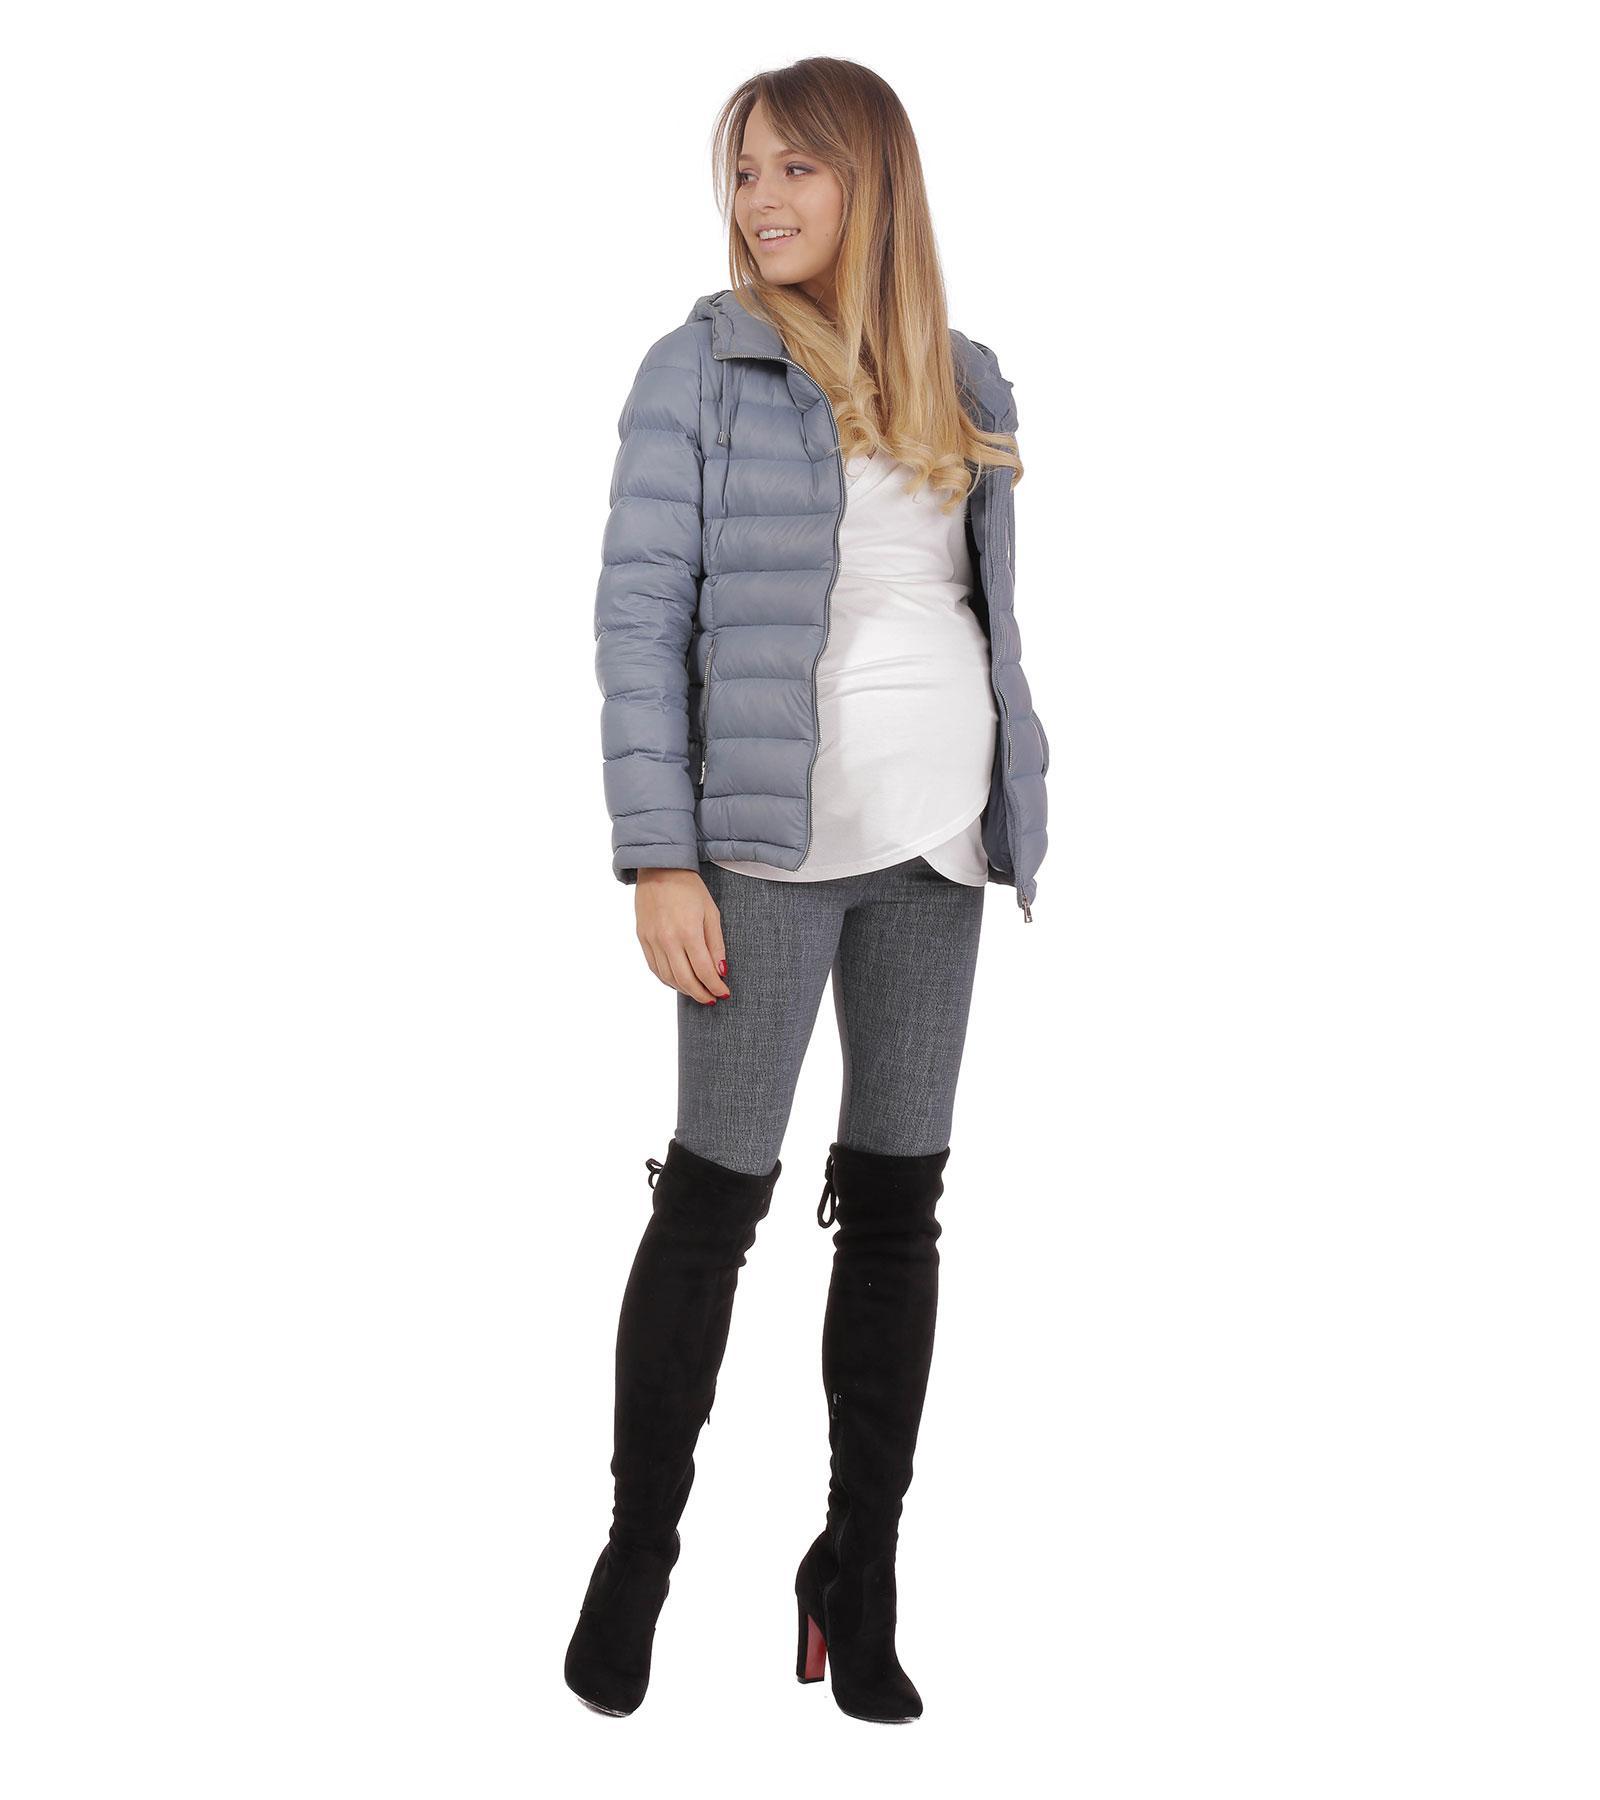 Jesienno - zimowe legginsy ciążowe Weronika Bensini®